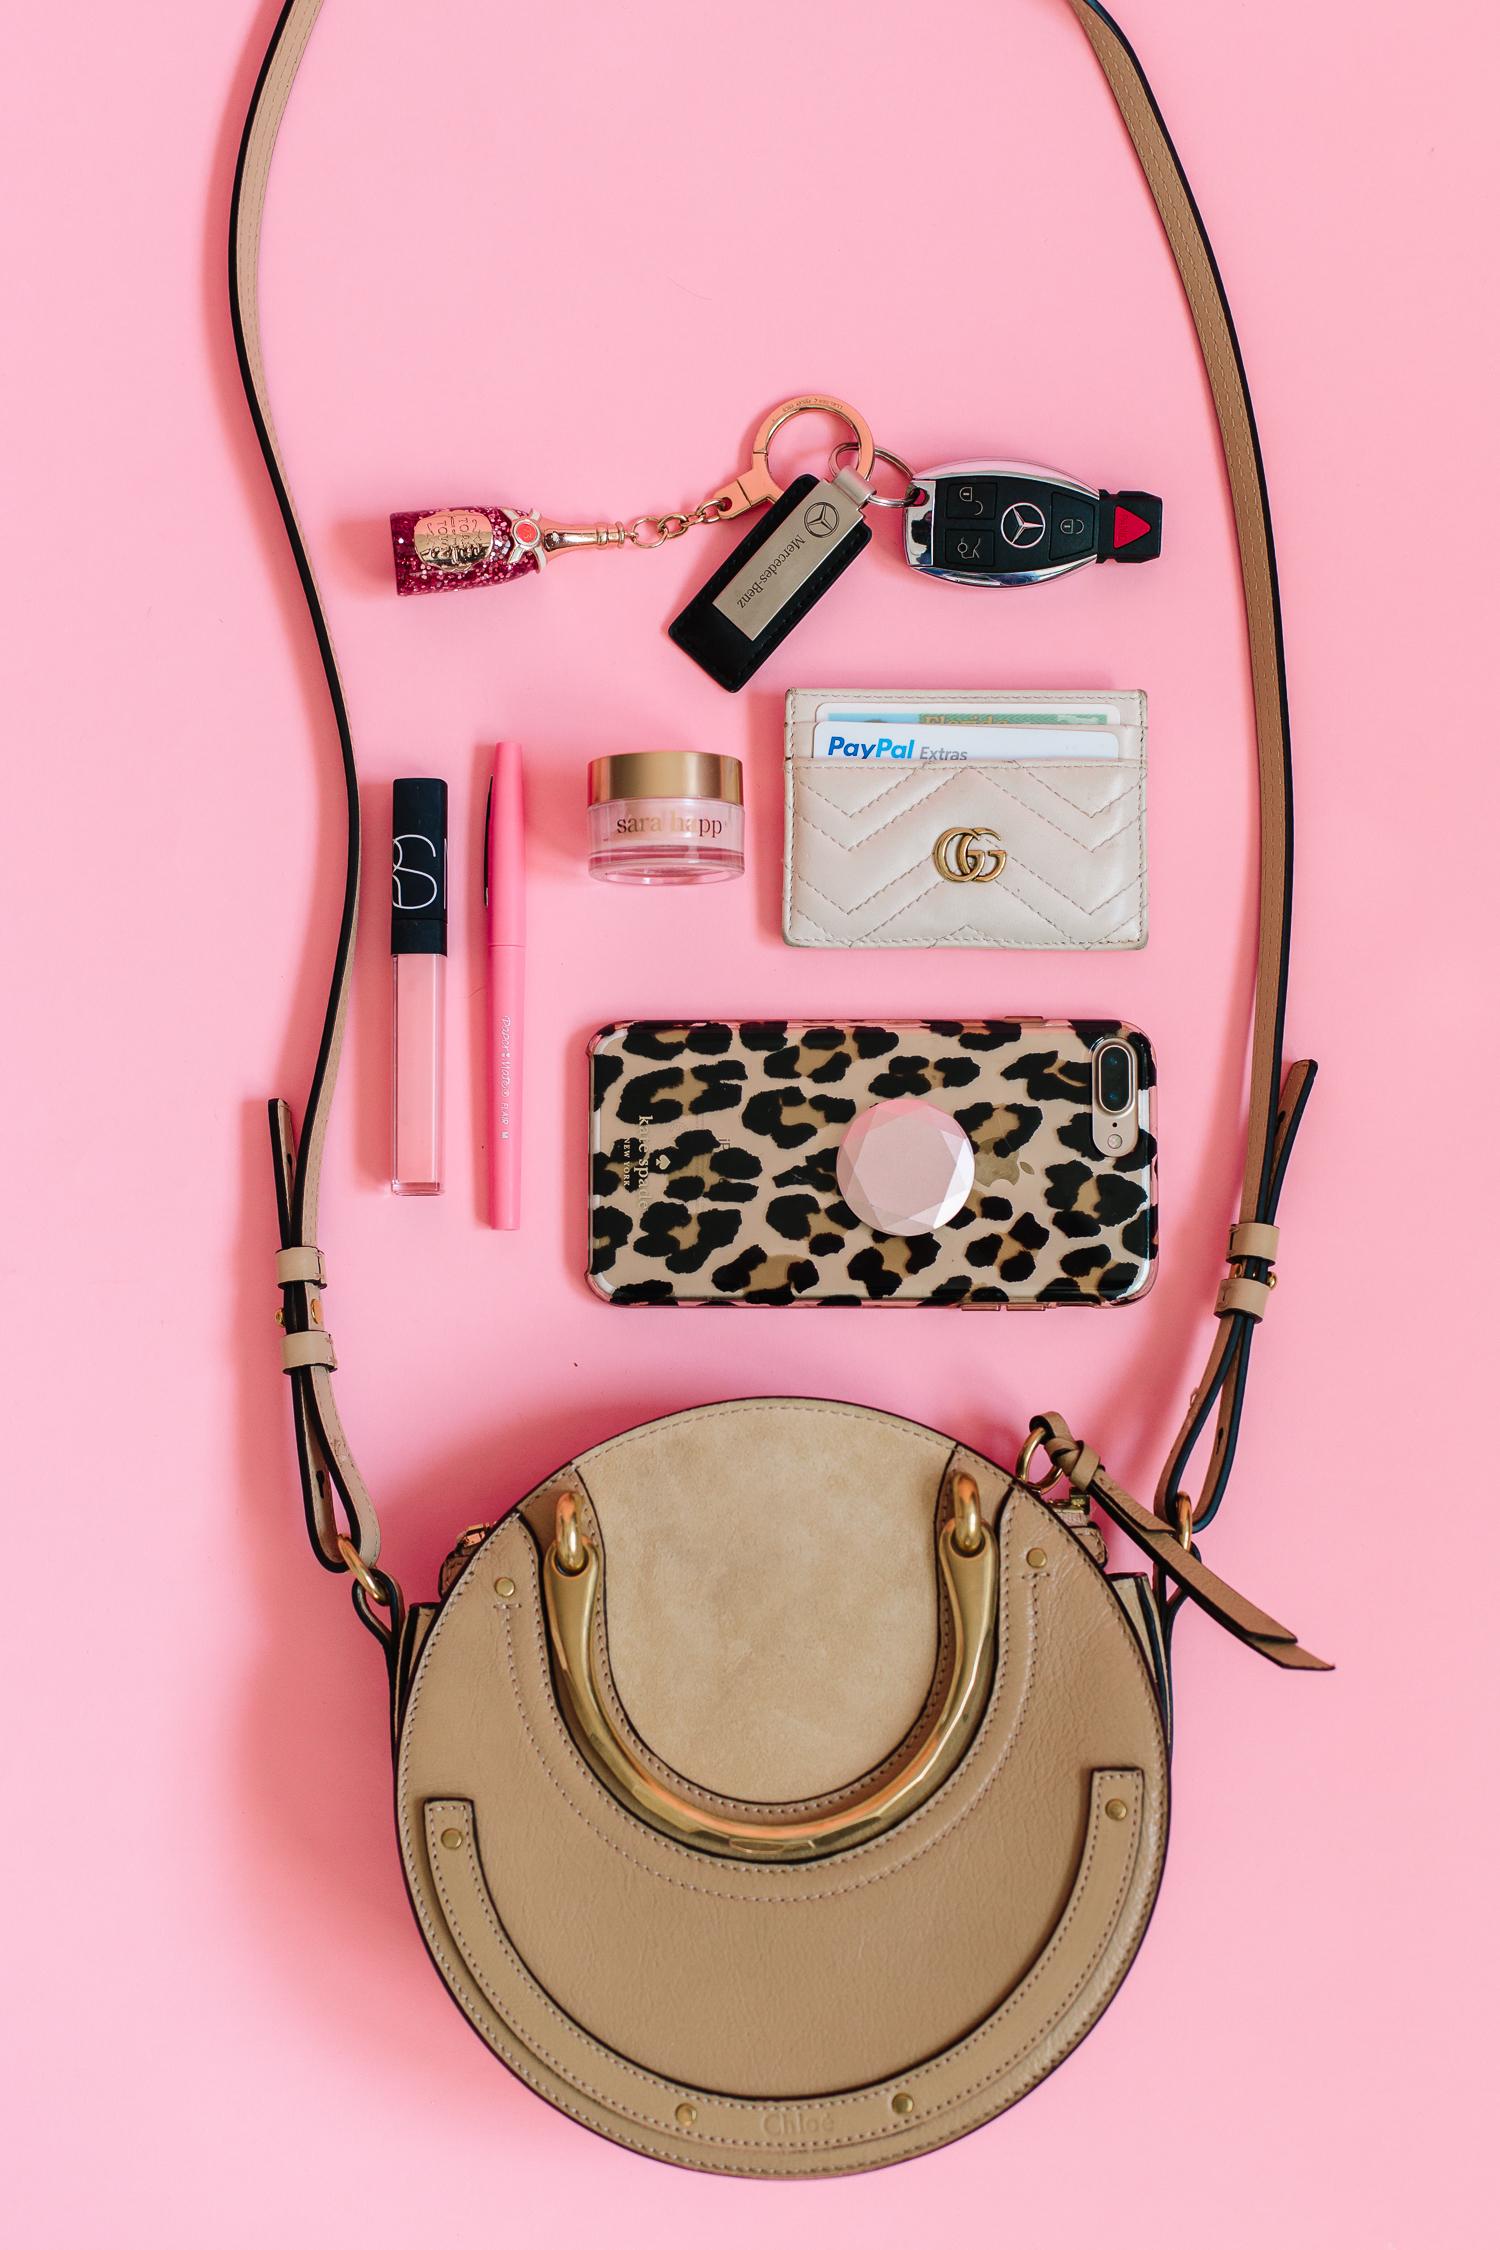 chloe Pixie leather and suede shoulder bag, chloe cross body, chloe cross body handbag review, chloe handbag review